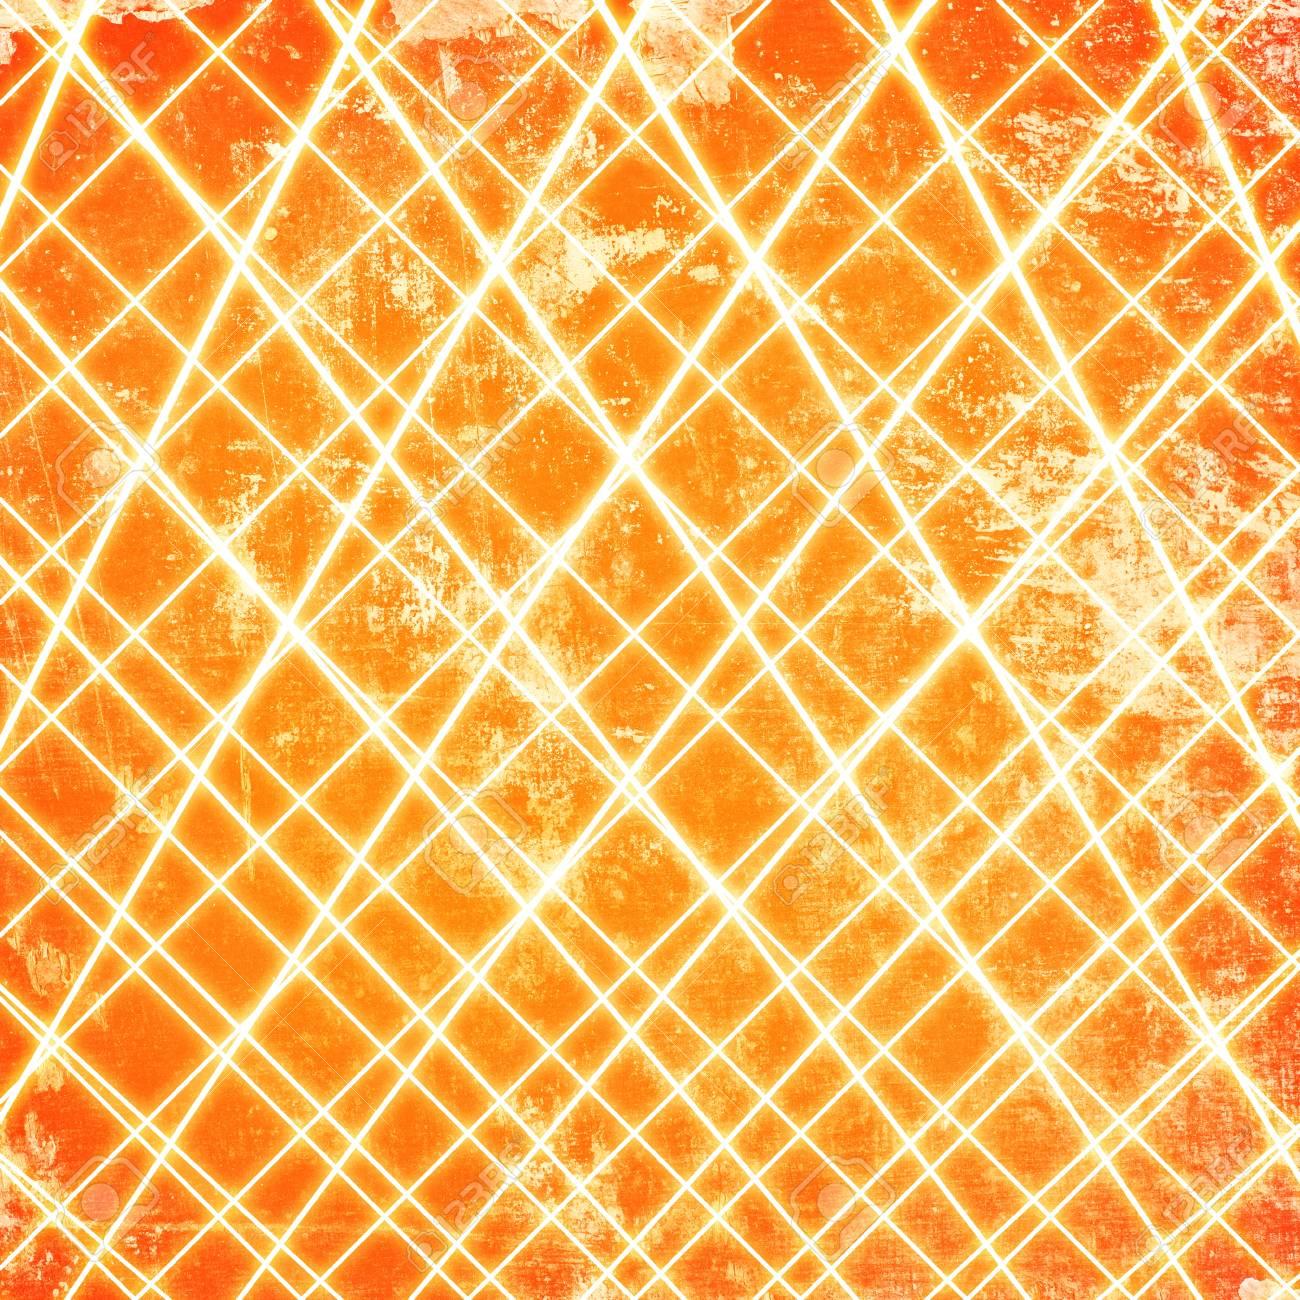 Abstract lines on grunge orange background Stock Photo - 15666098